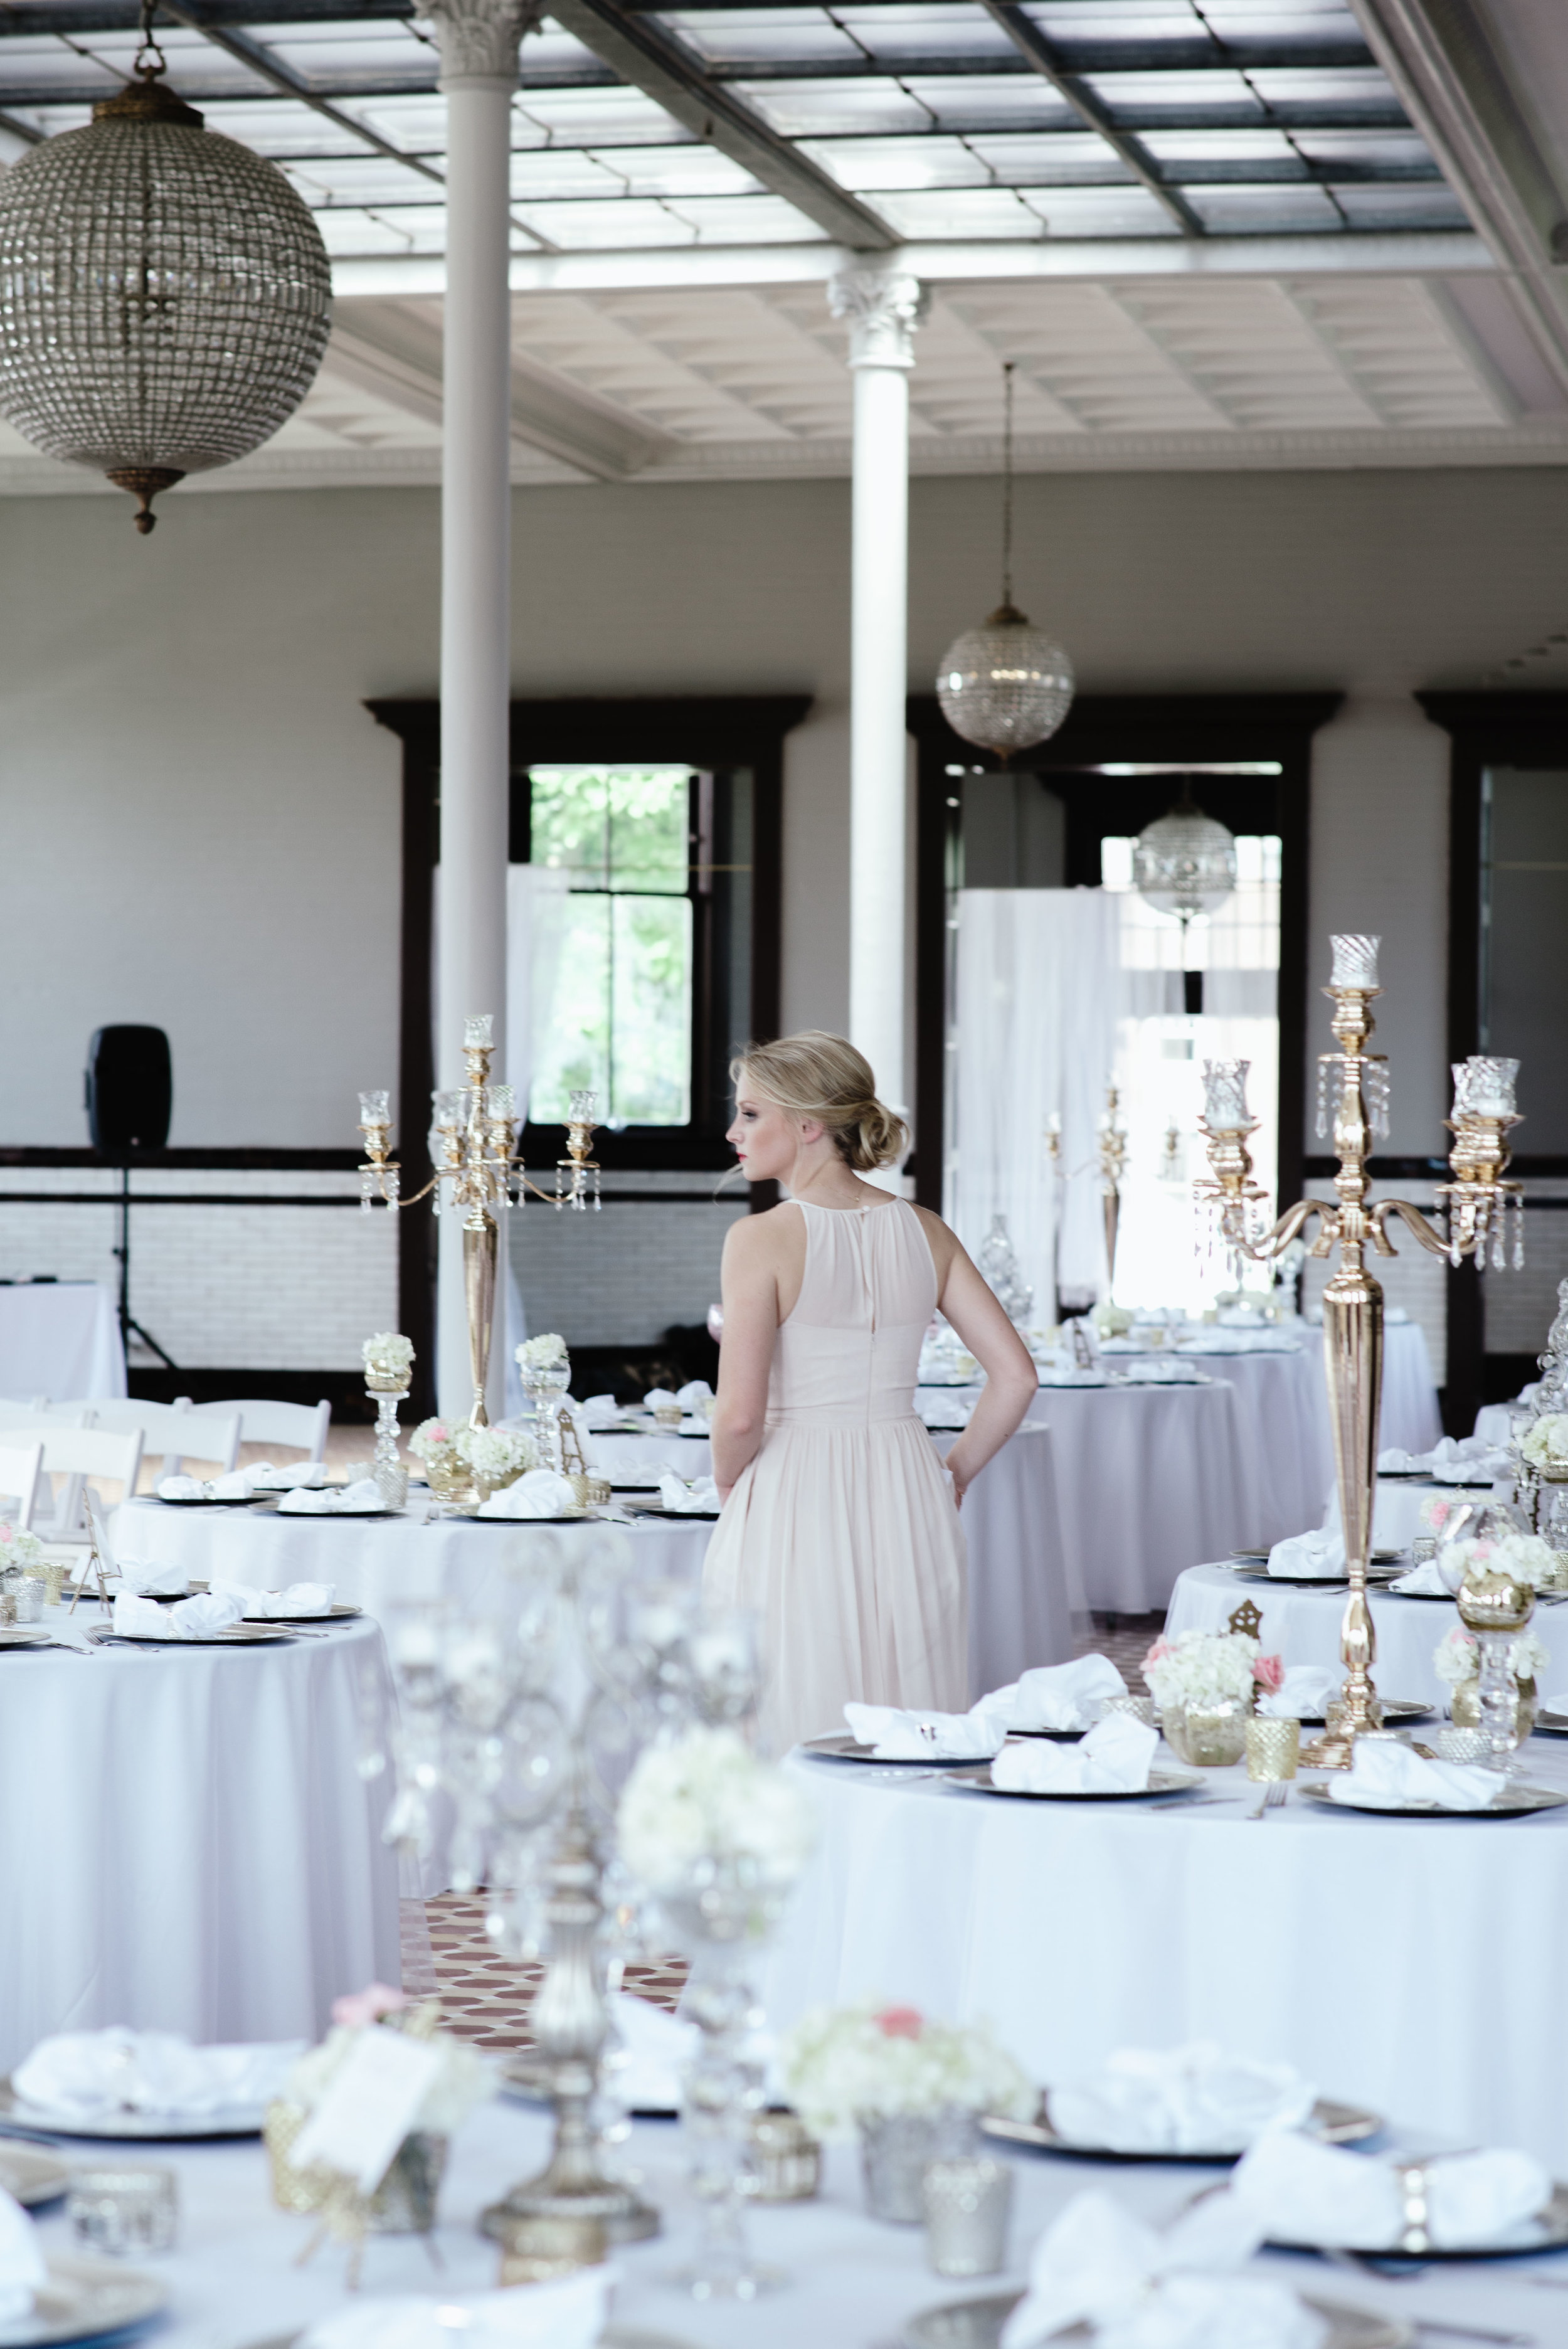 Mina-Steve-Blog-Indianapolis-Wedding-68.jpg